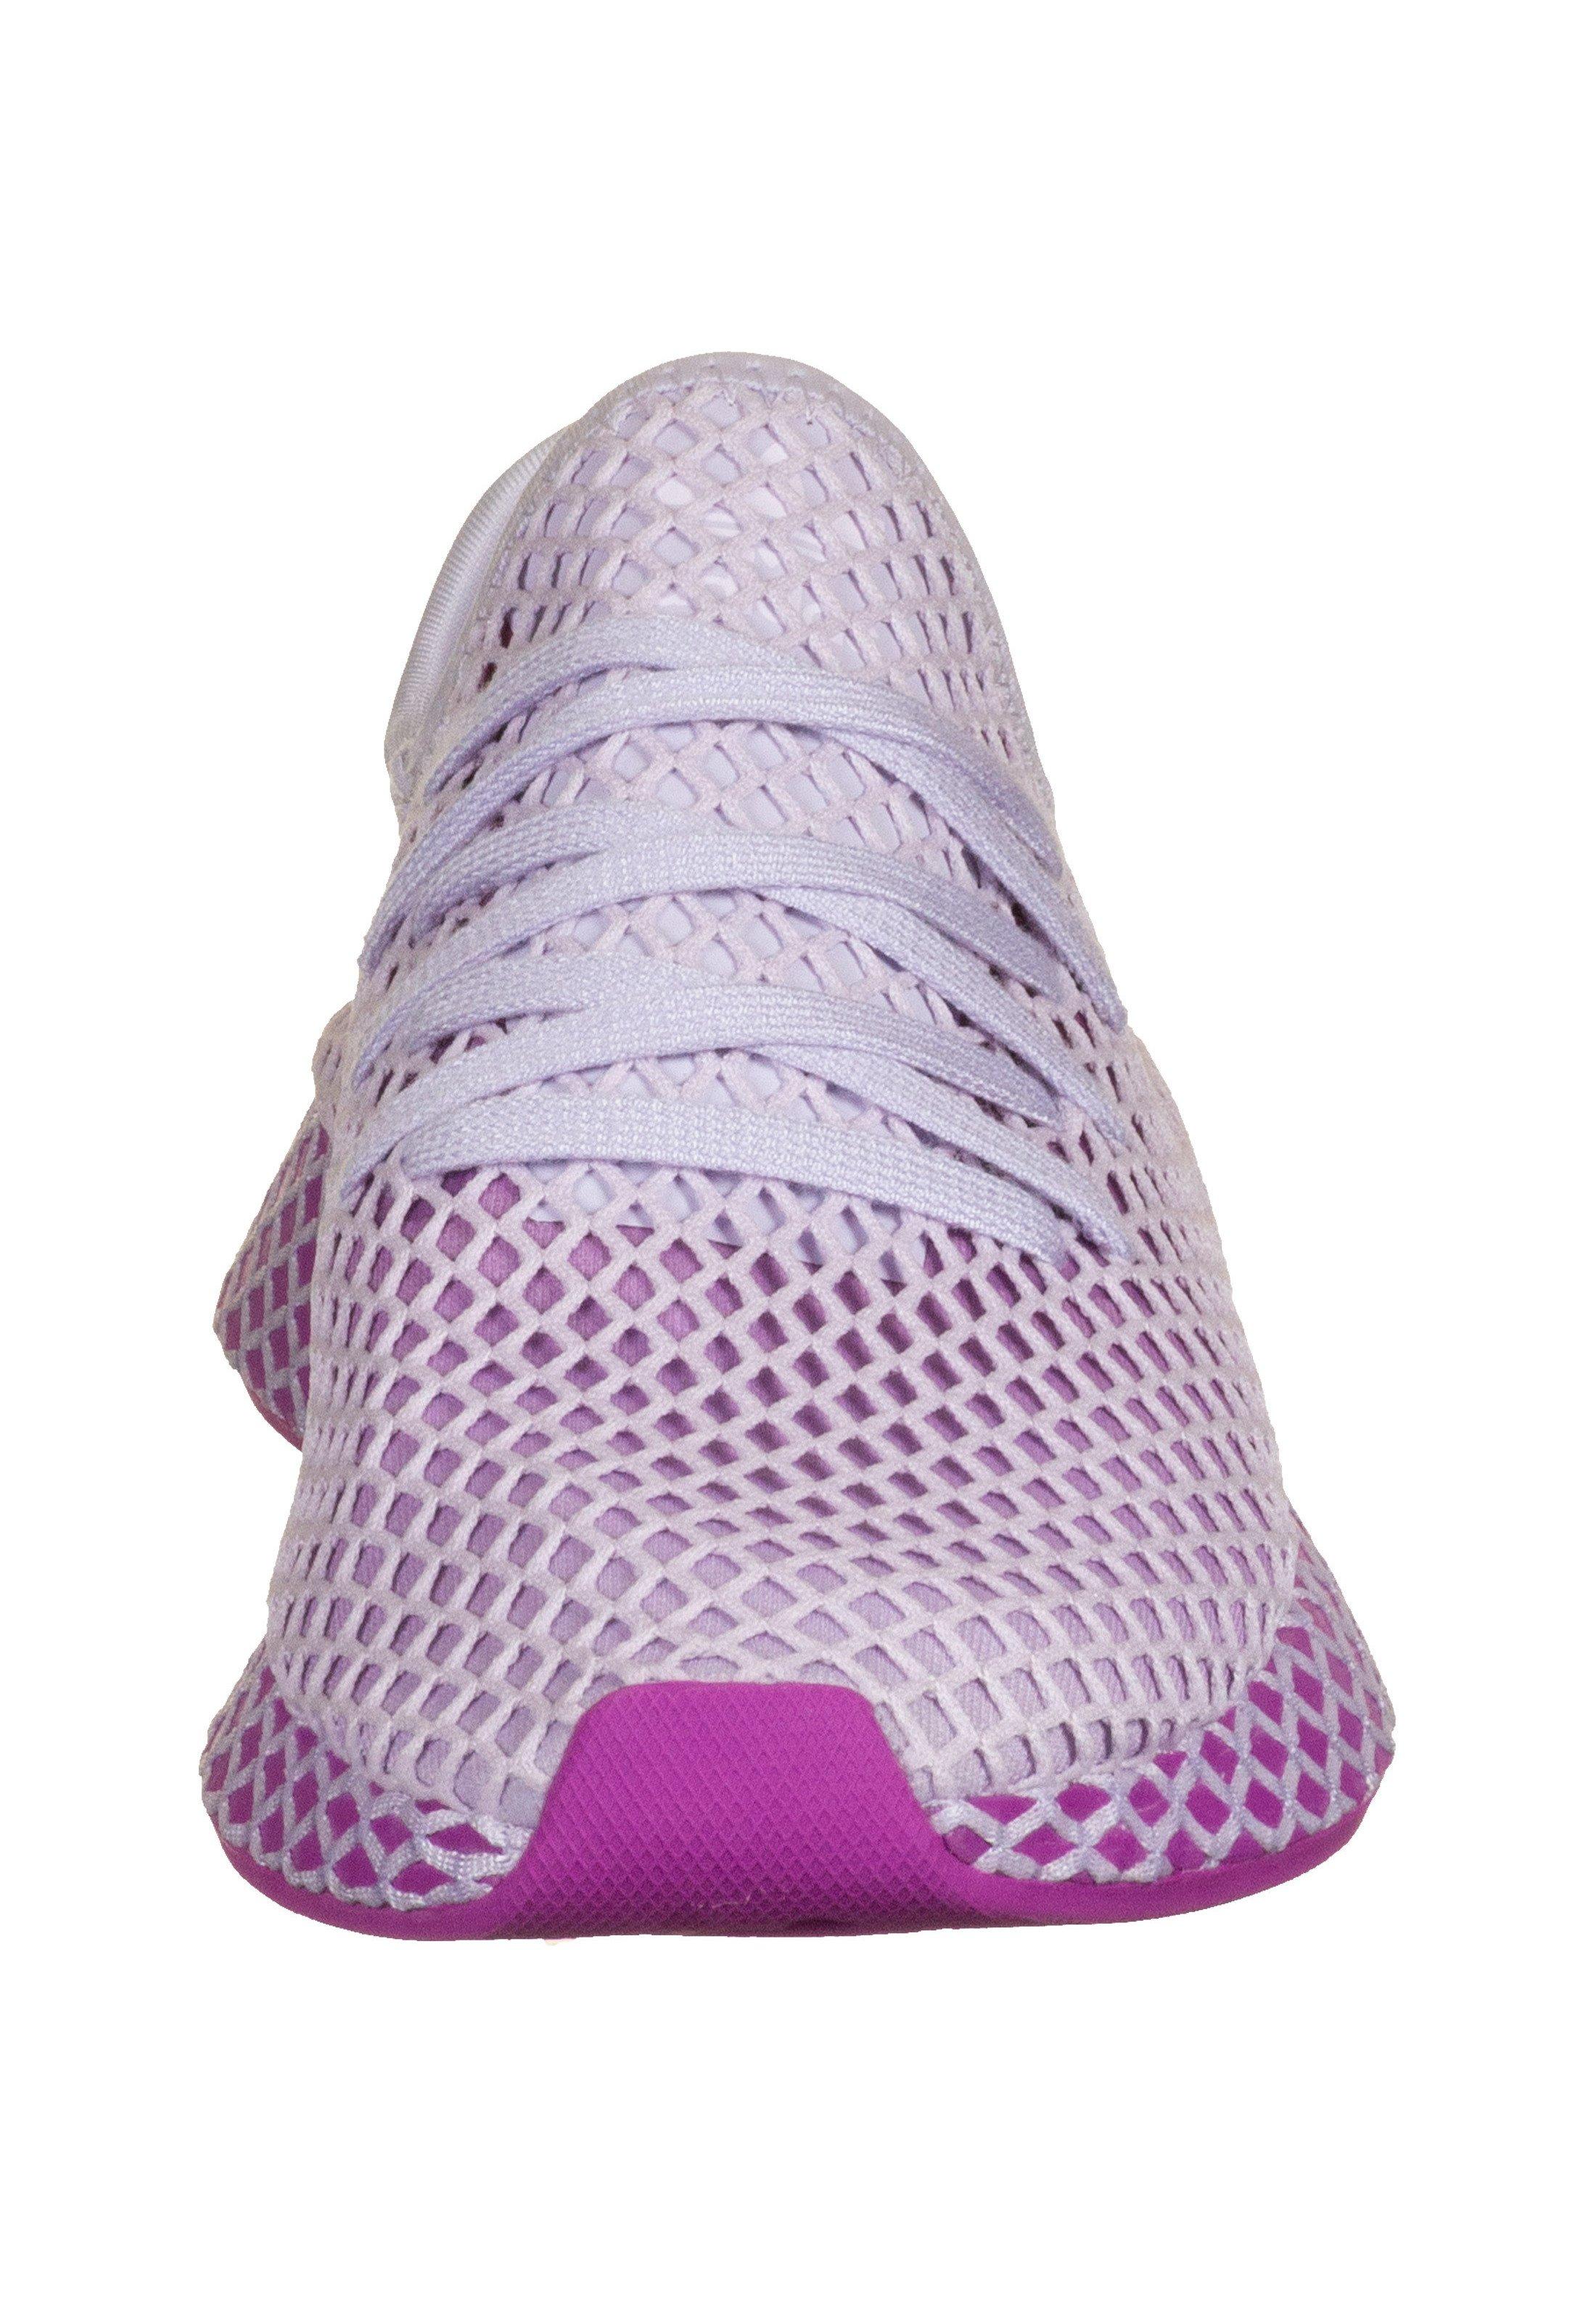 Adidas Originals Deerupt Runner - Baskets Basses Purple/white GLBYmKd